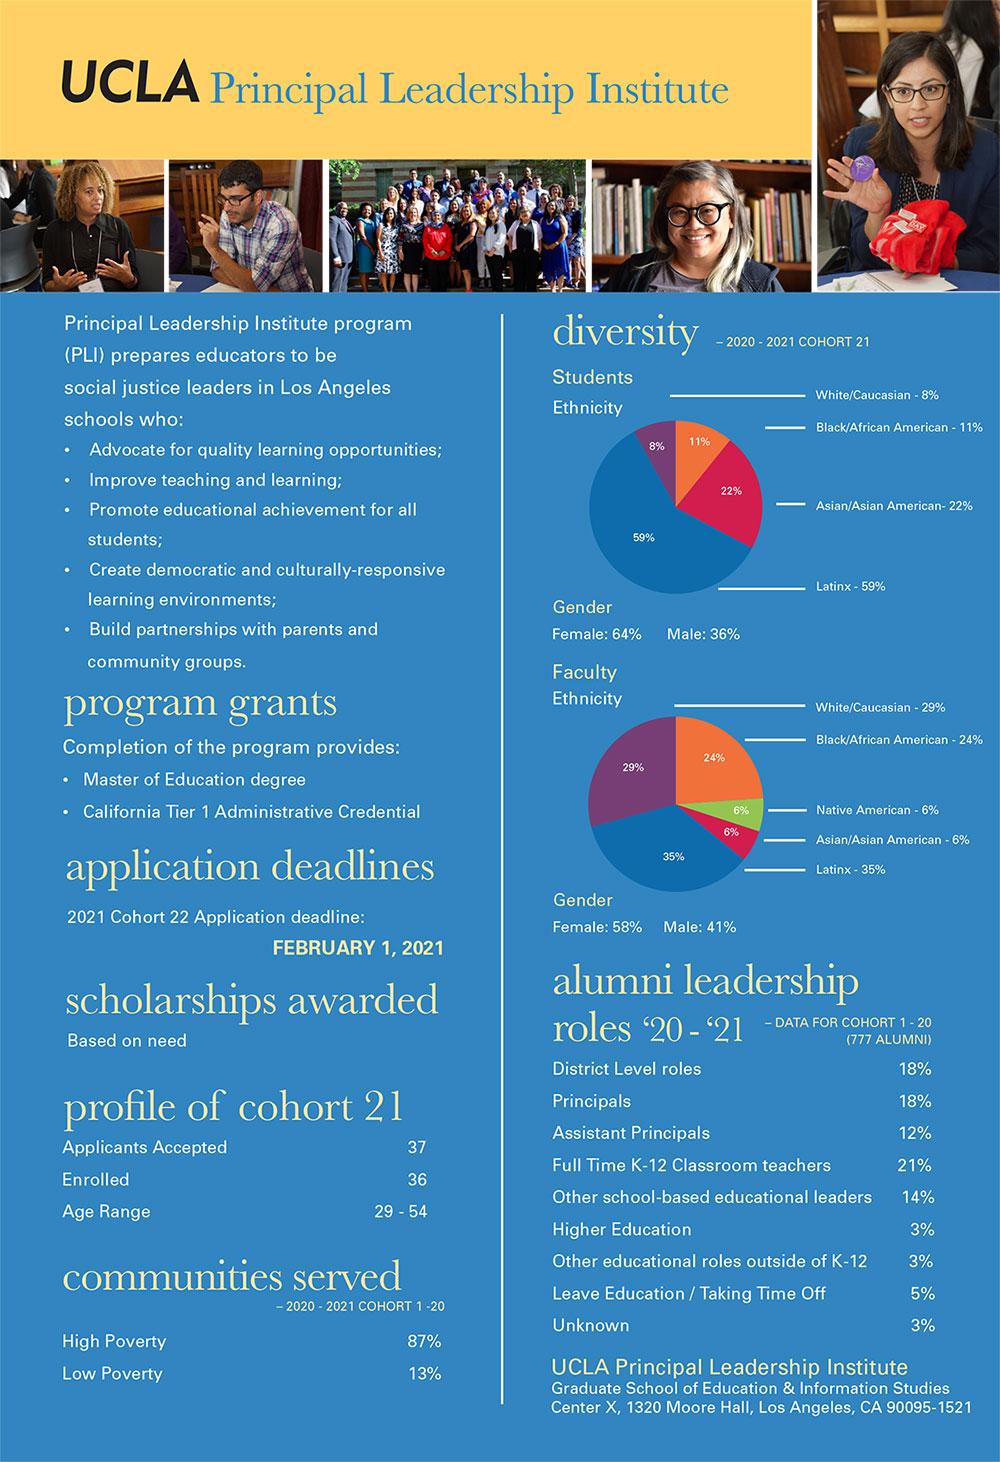 UCLA Principal Leadership Institute Facts